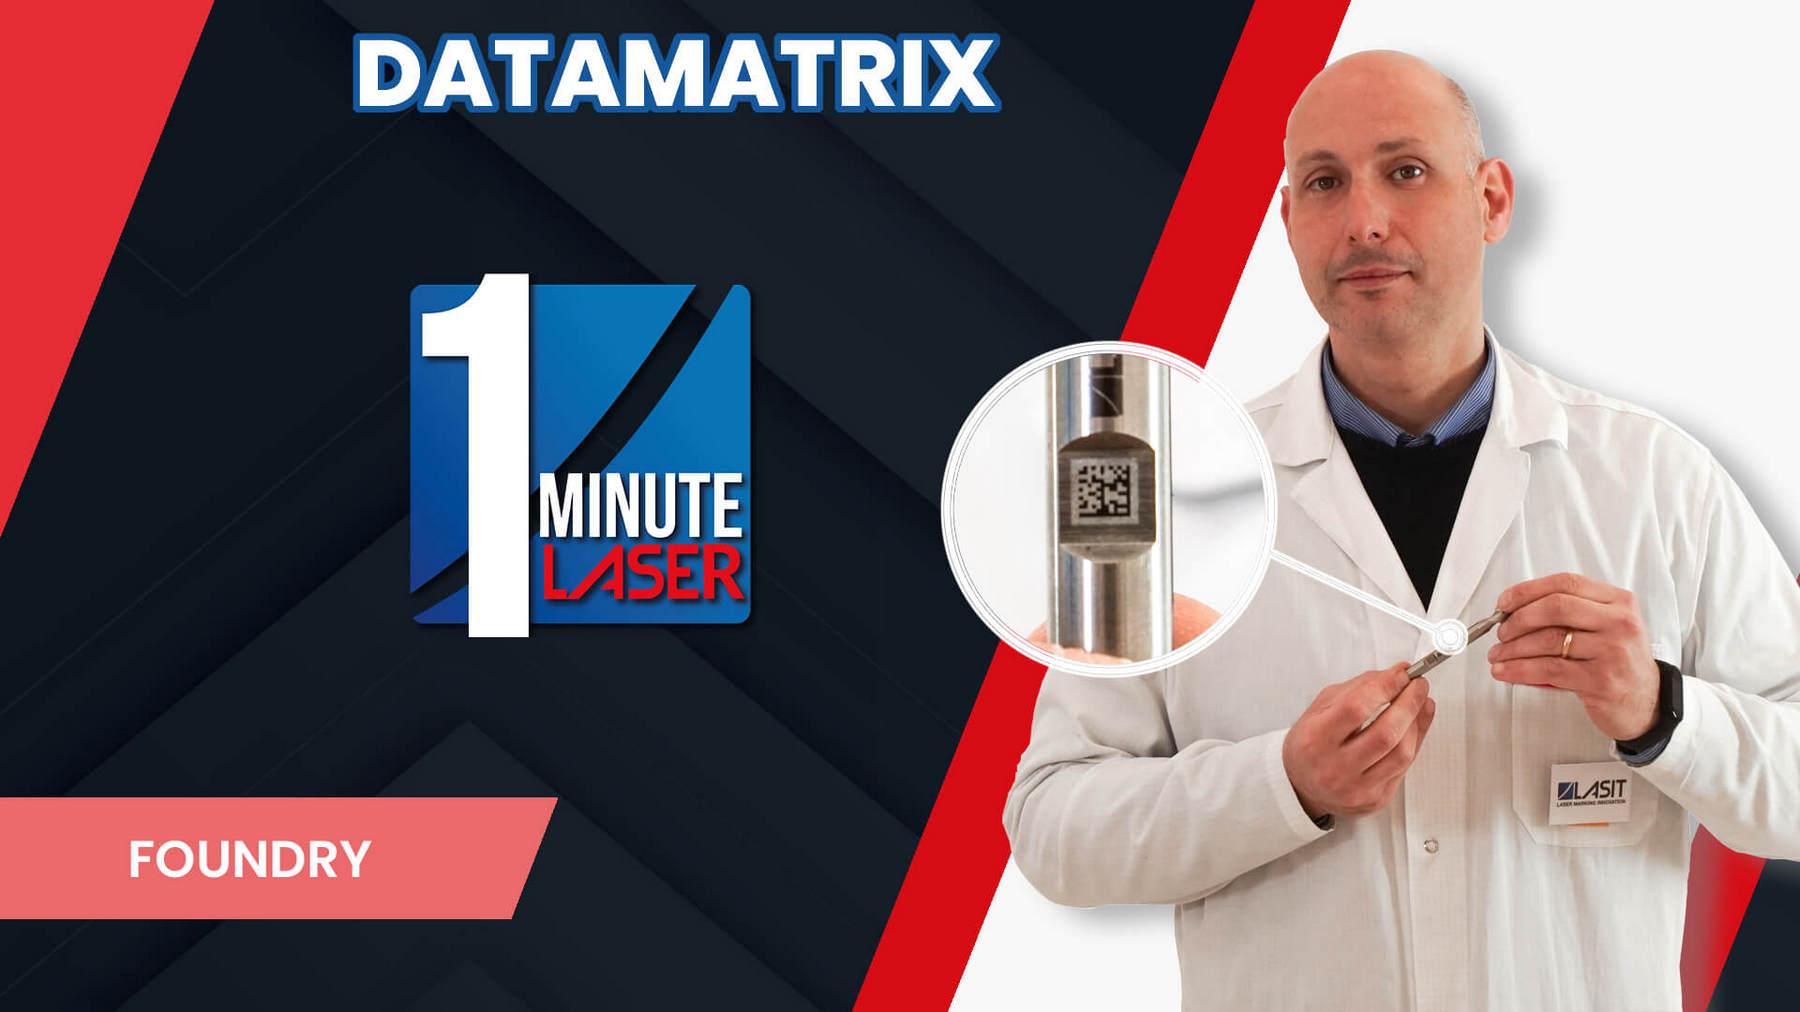 One-Minute-Laser-3-Datamatrix_COPERTINA Foundry